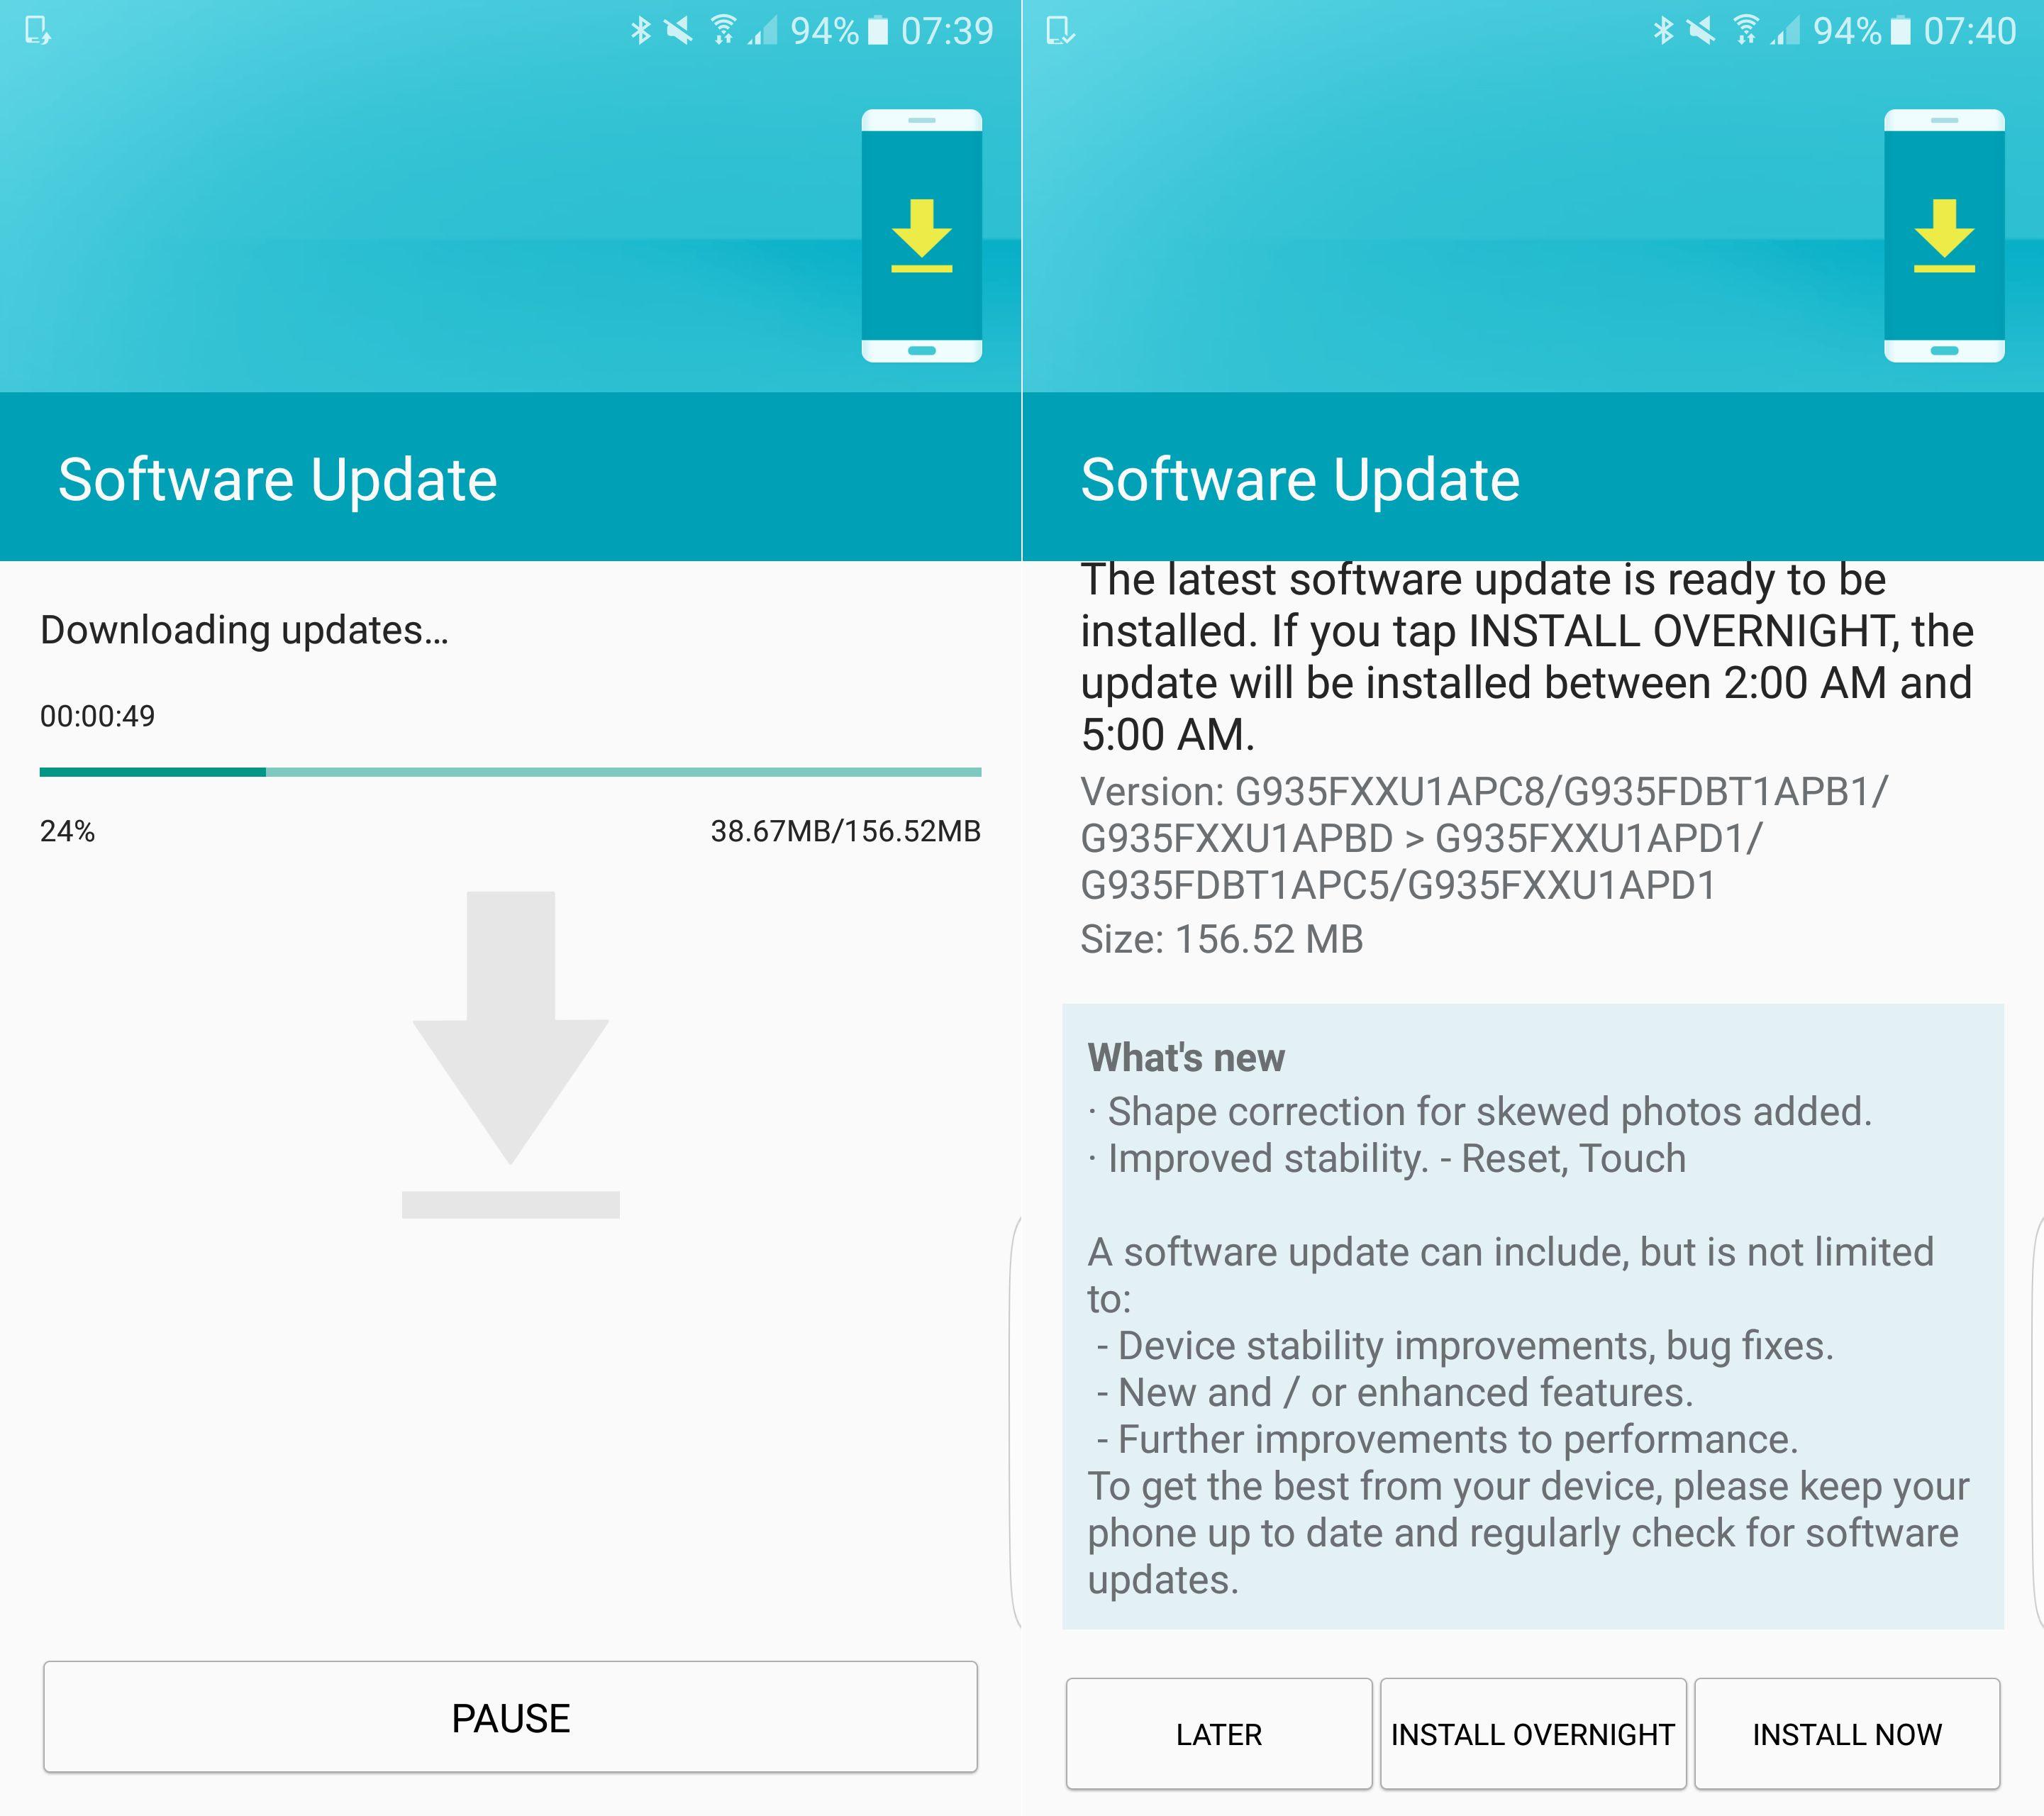 Samsung Galaxy S7 & S7 Edge Get A Crucial Firmware Update